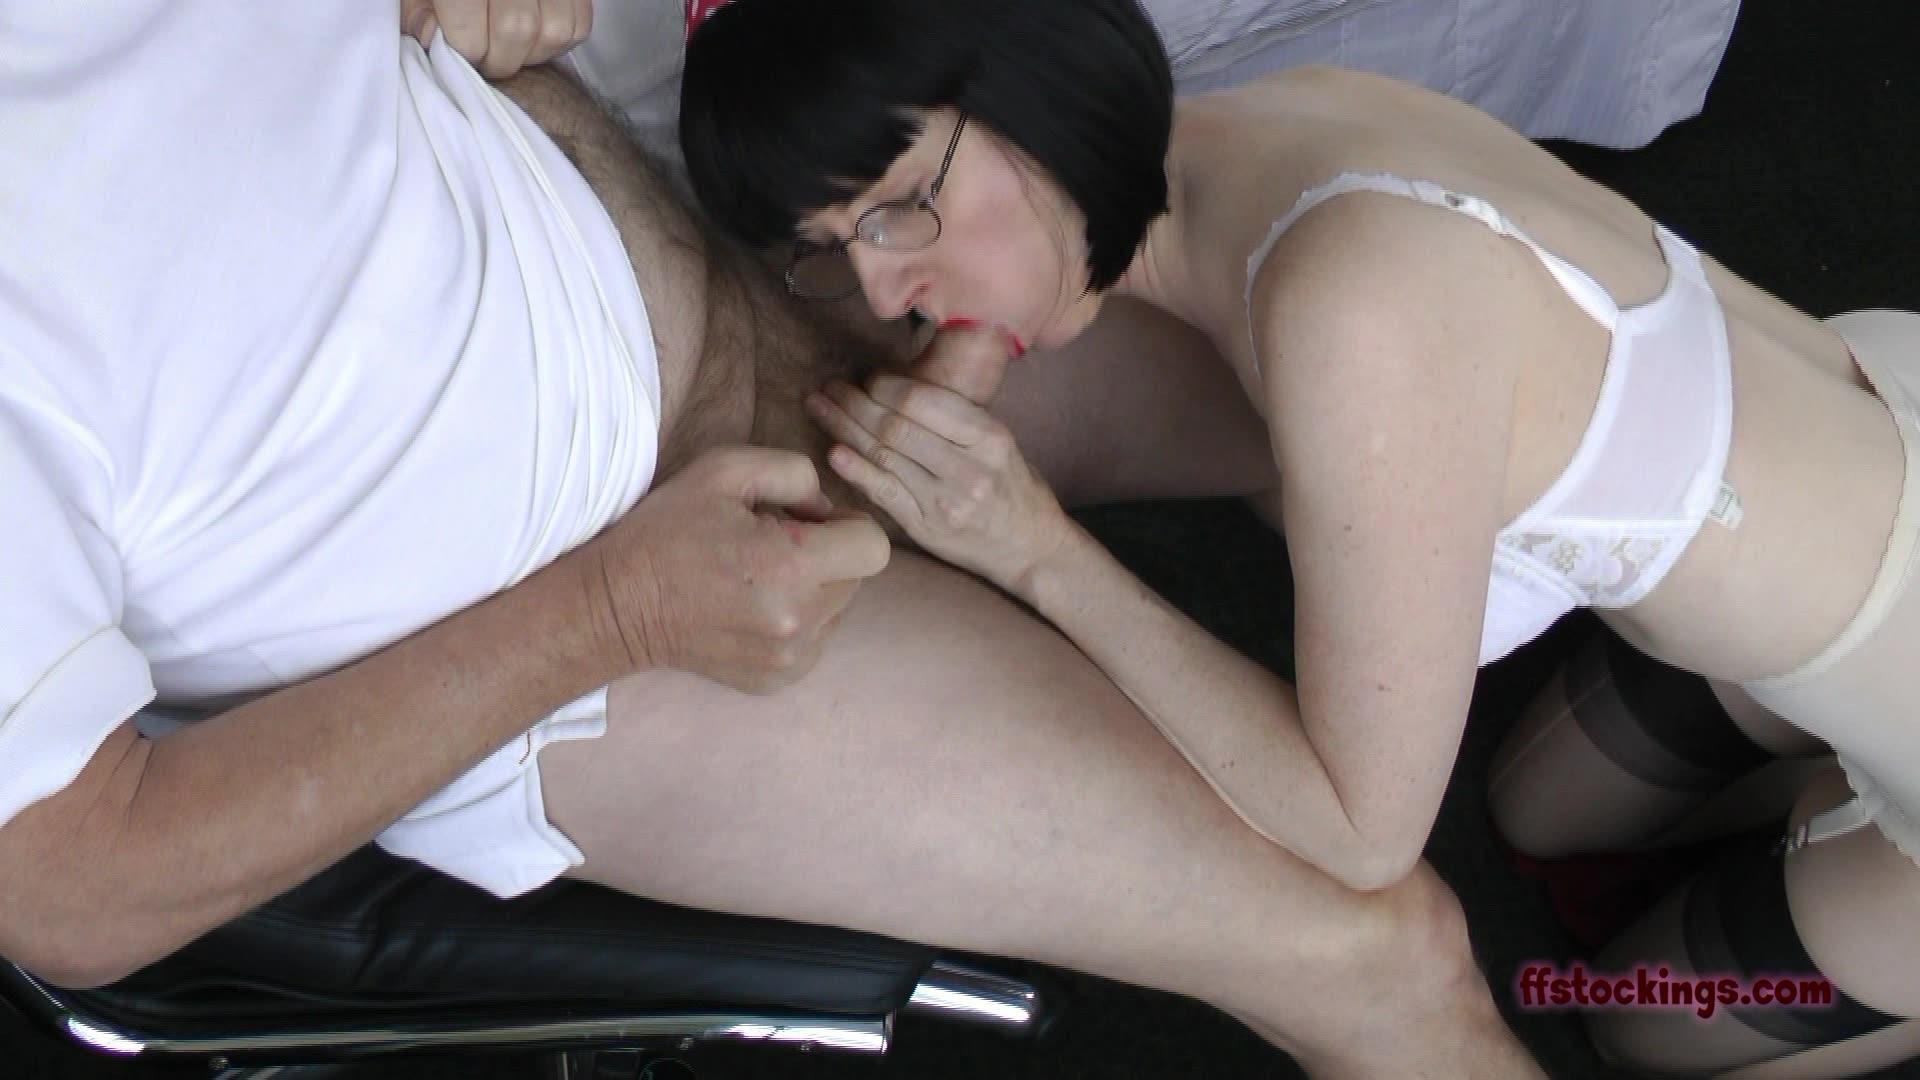 Monica mattos and fisting